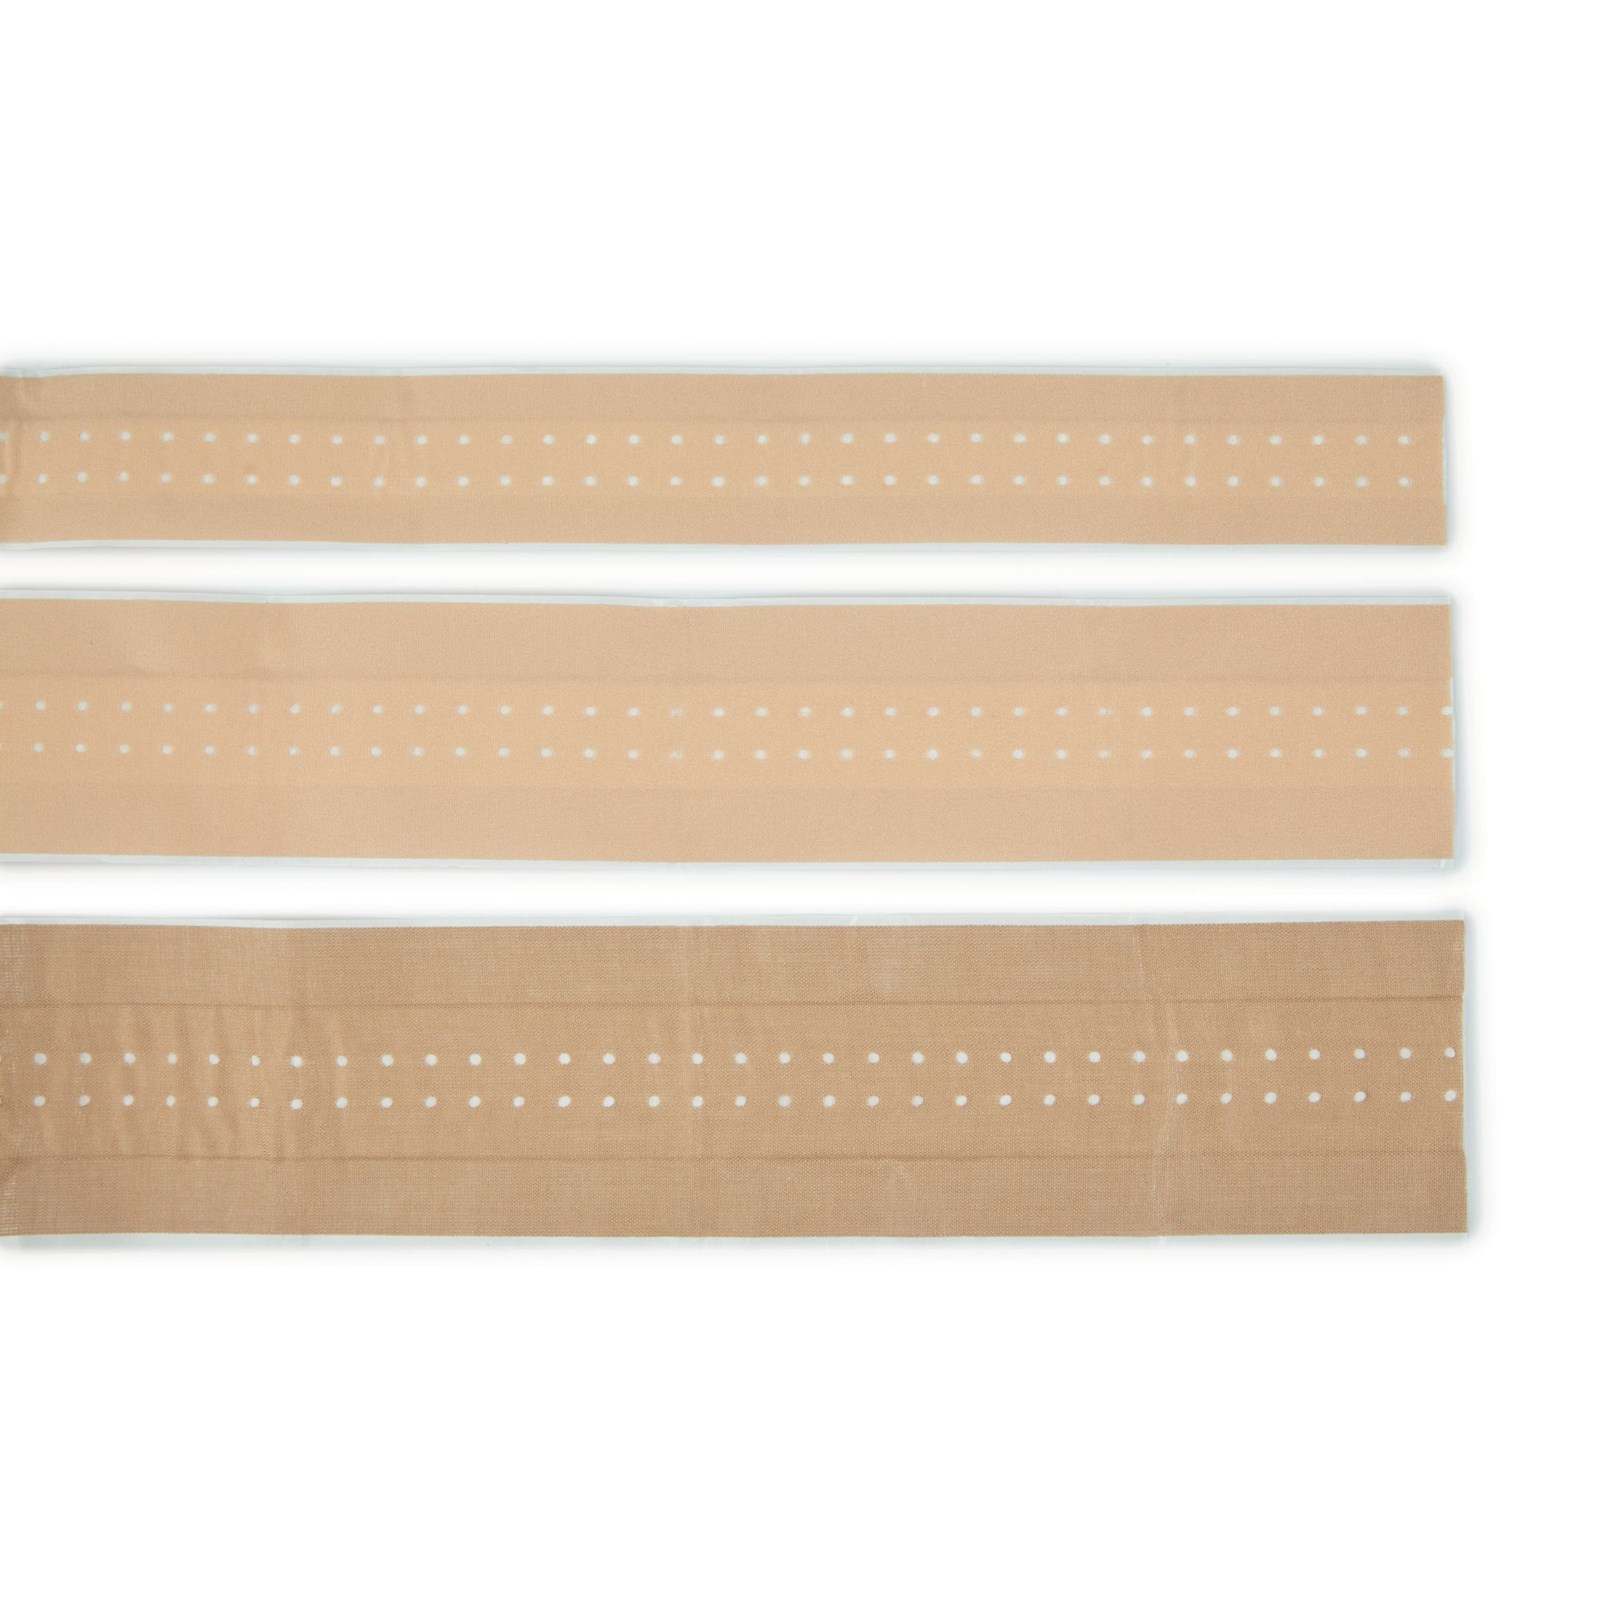 Fabric Dressing Strip 1m X 4cm Pack 10